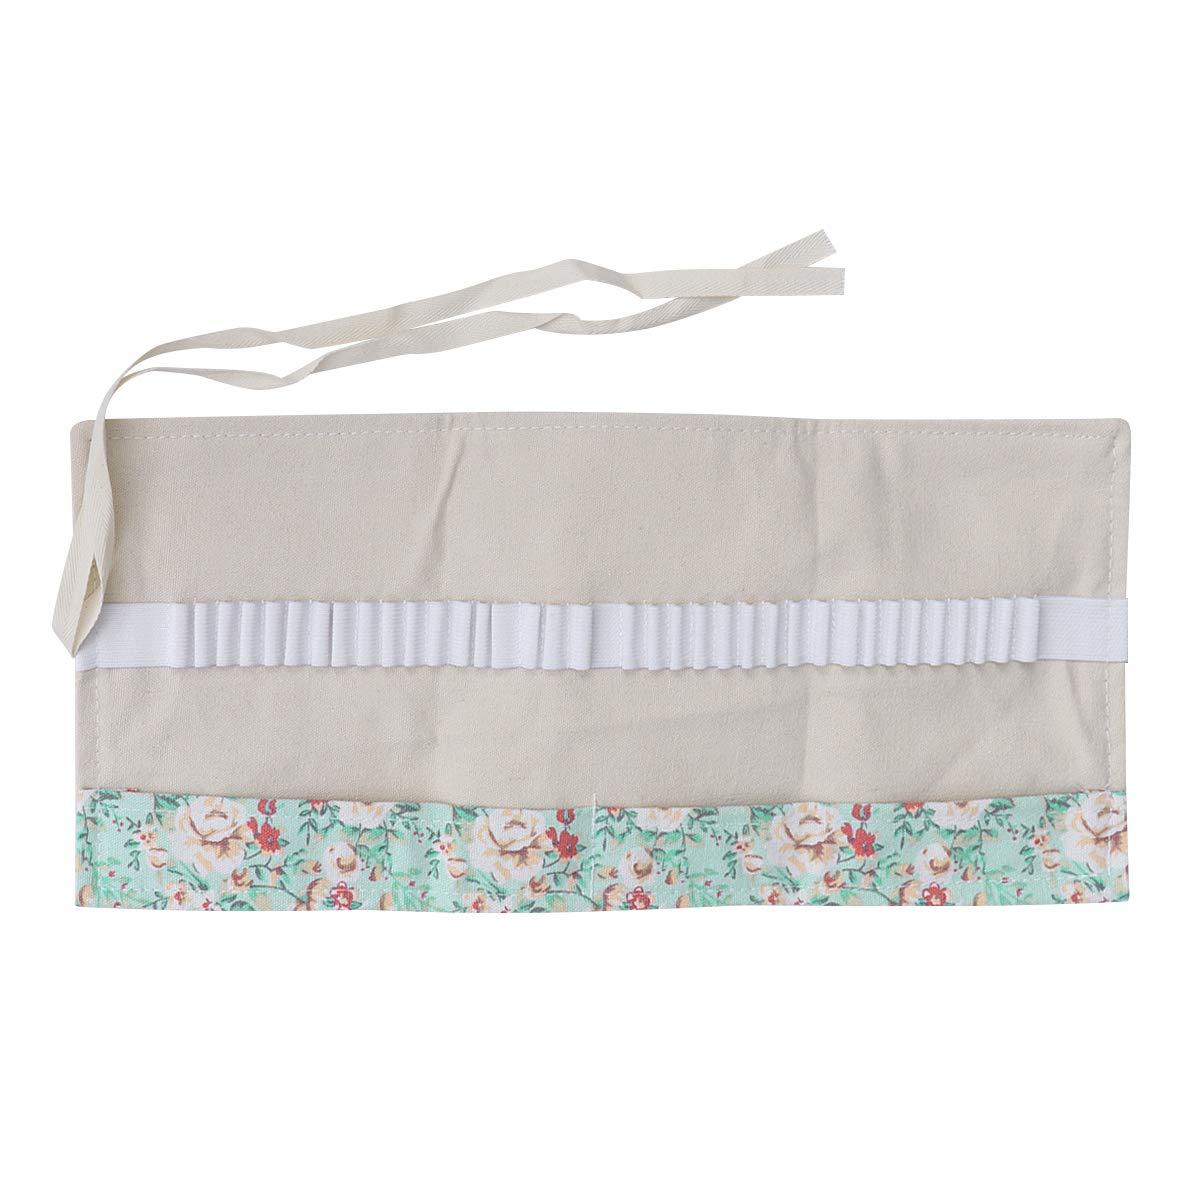 rosa fresca Toyvian 36 Slots Estuche enrollable organizadores lavables bolsa para l/ápices almacenamiento Wrap bolsa soporte estilo /étnico para grader ni/ña pintura